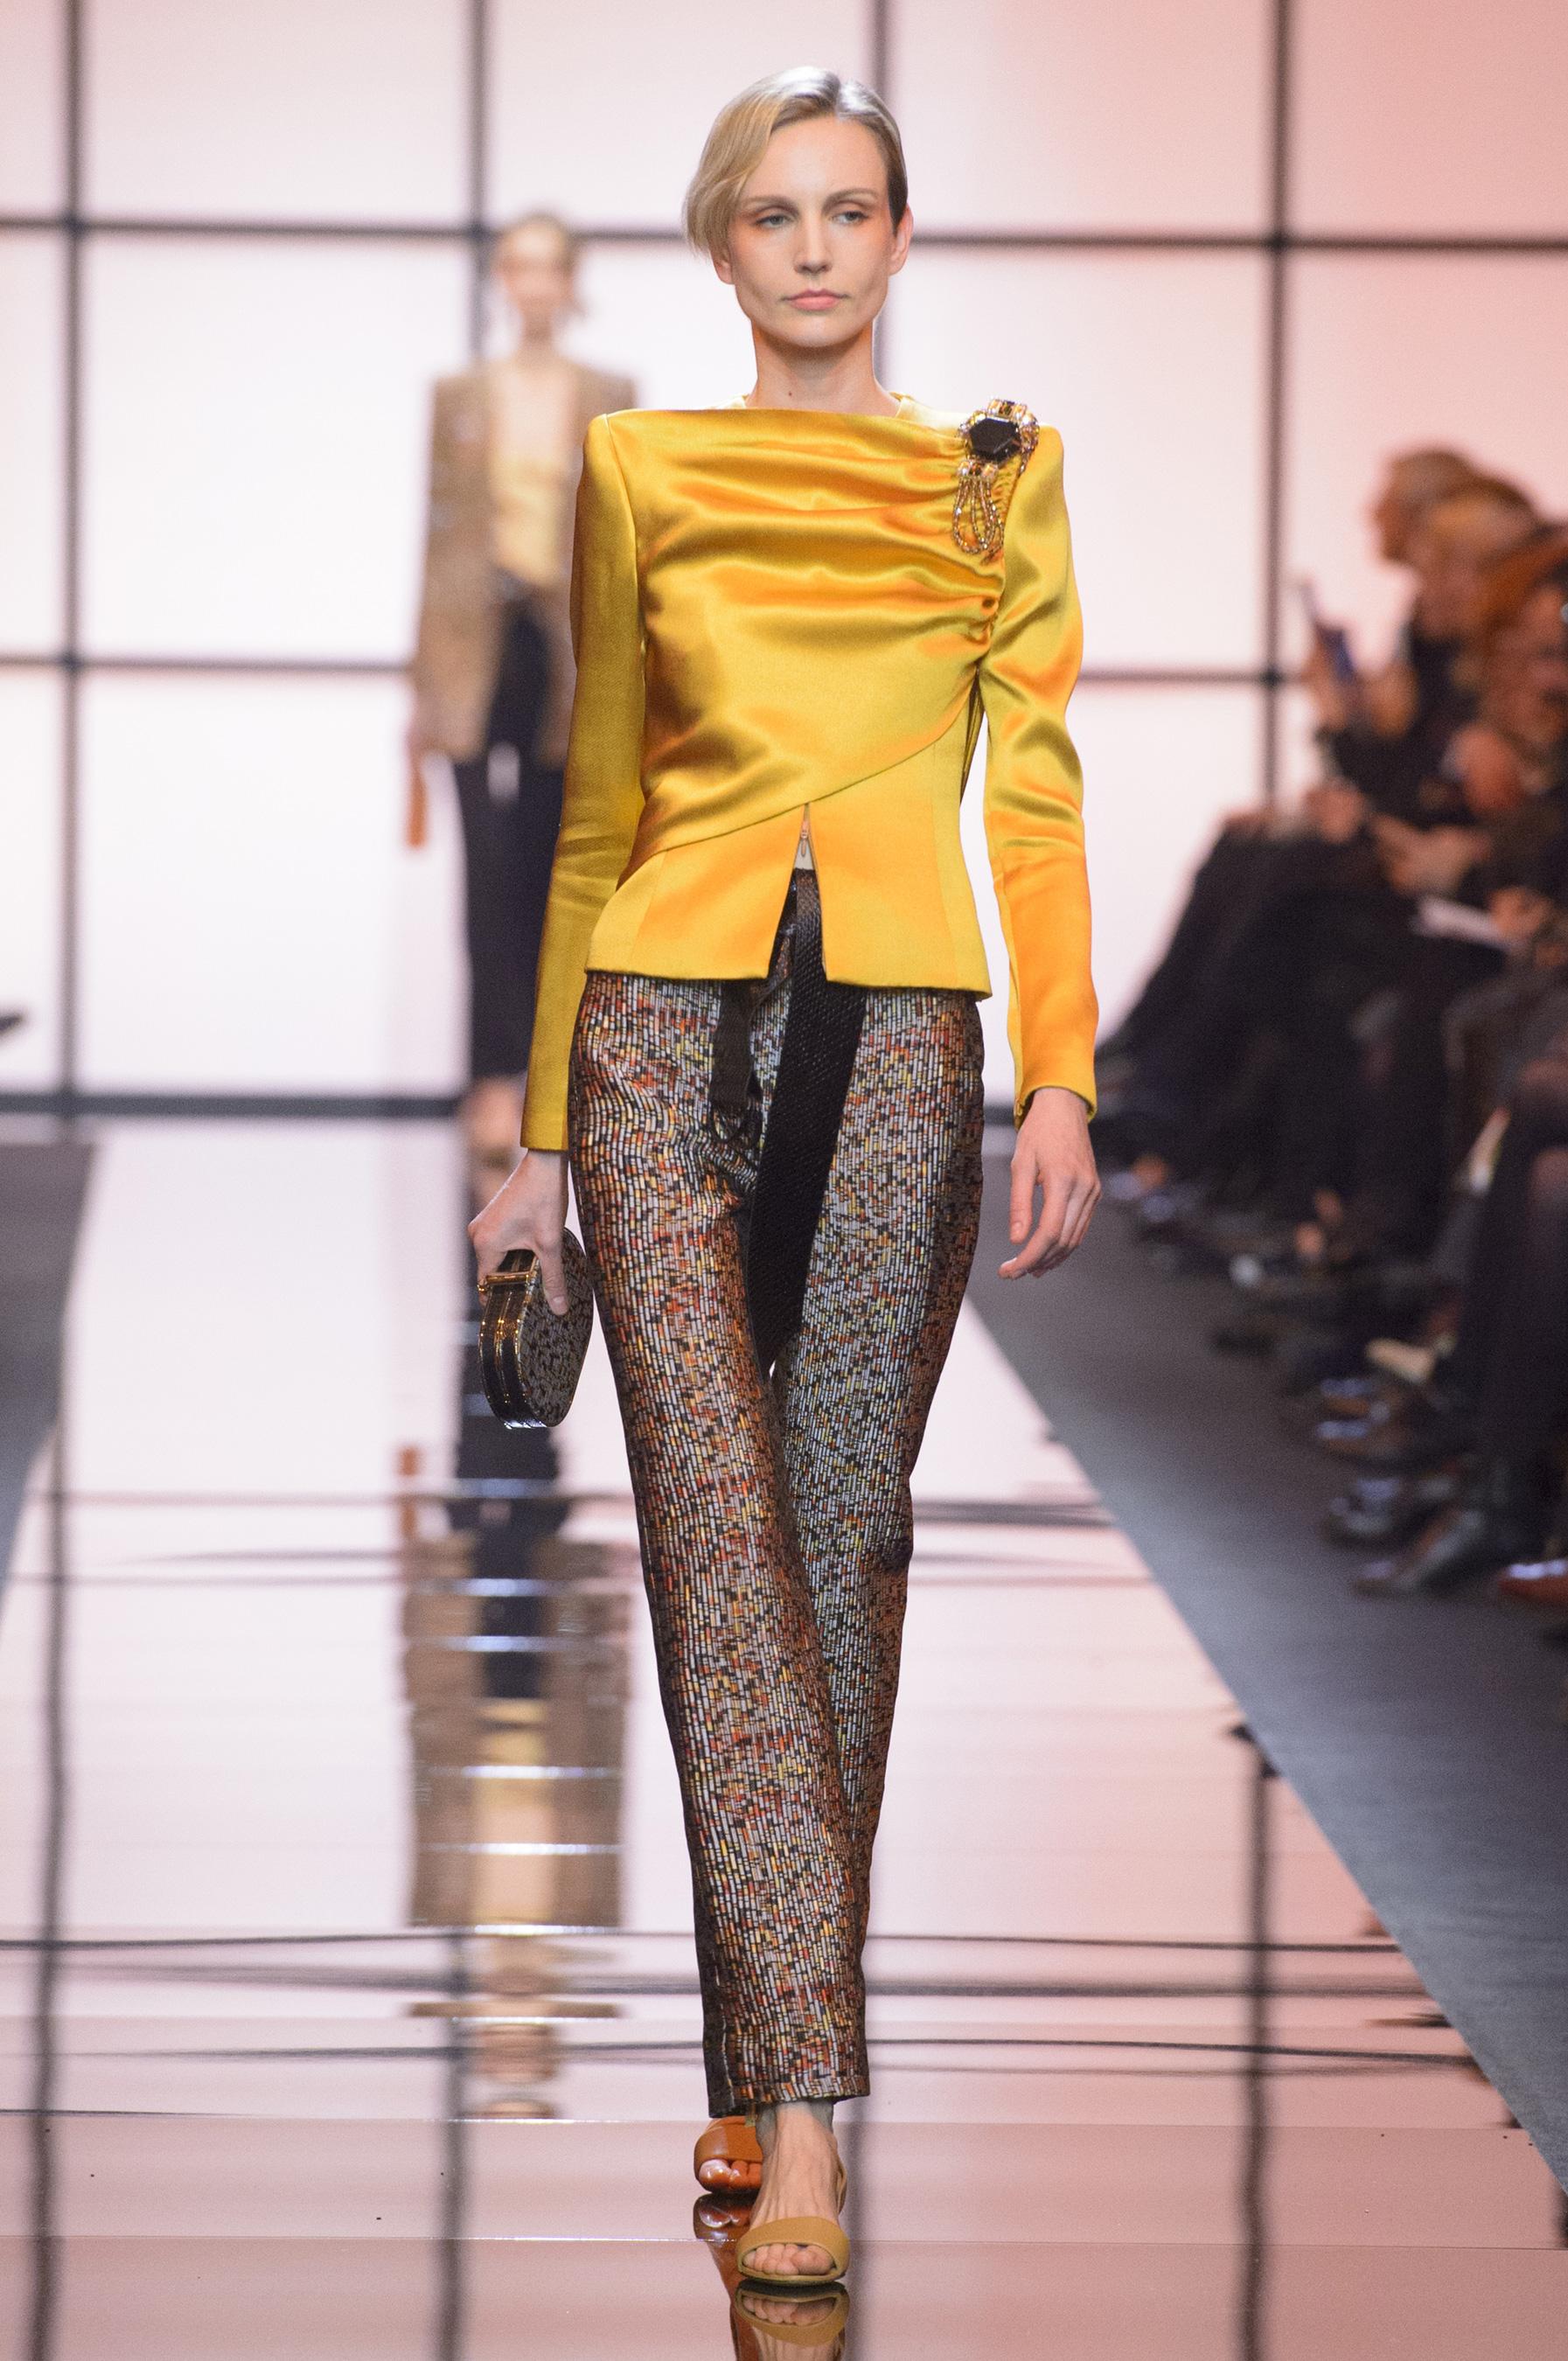 Poches Mode Long Armani Deux manteau Femme Jeans XiuOPTkZ